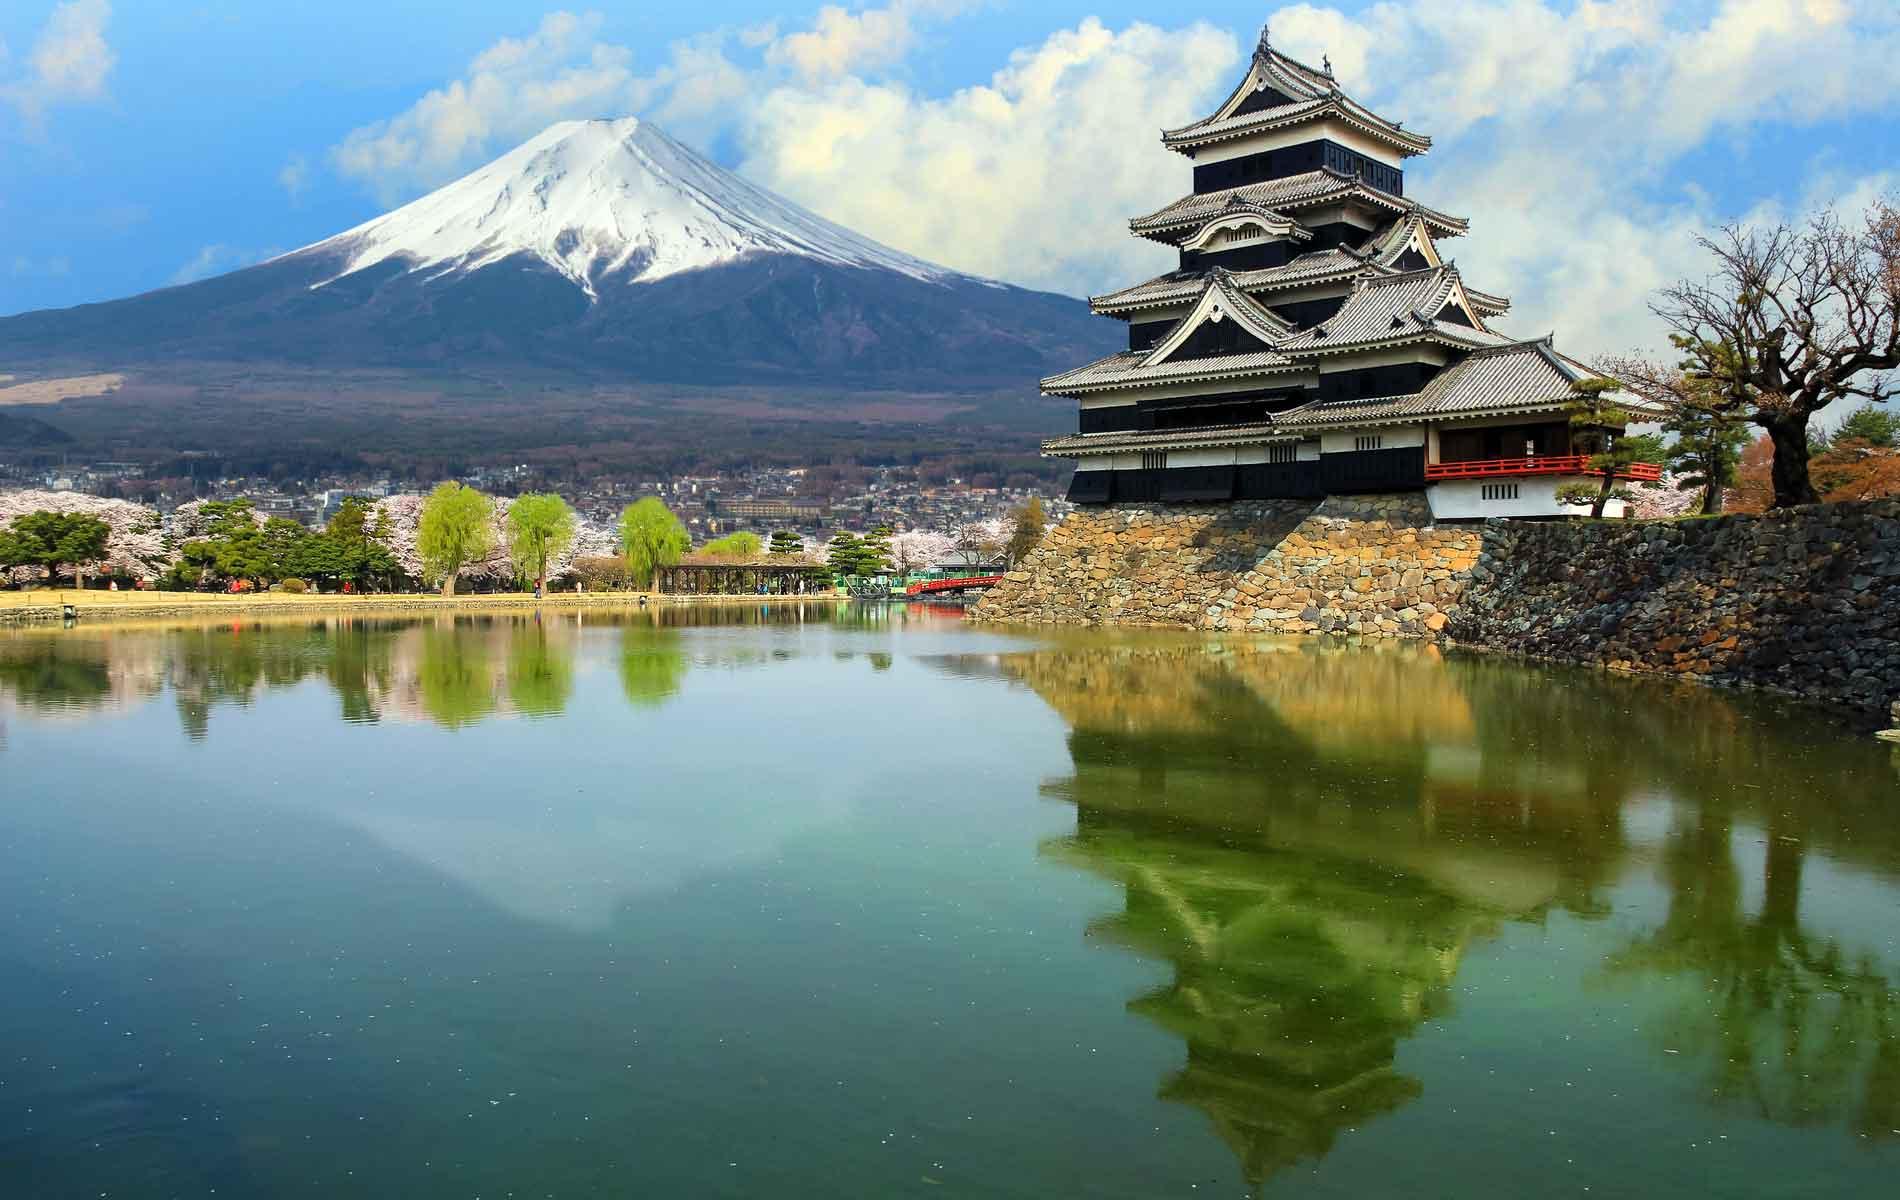 Matsumoto Castle with Mount Fuji as a backdrop